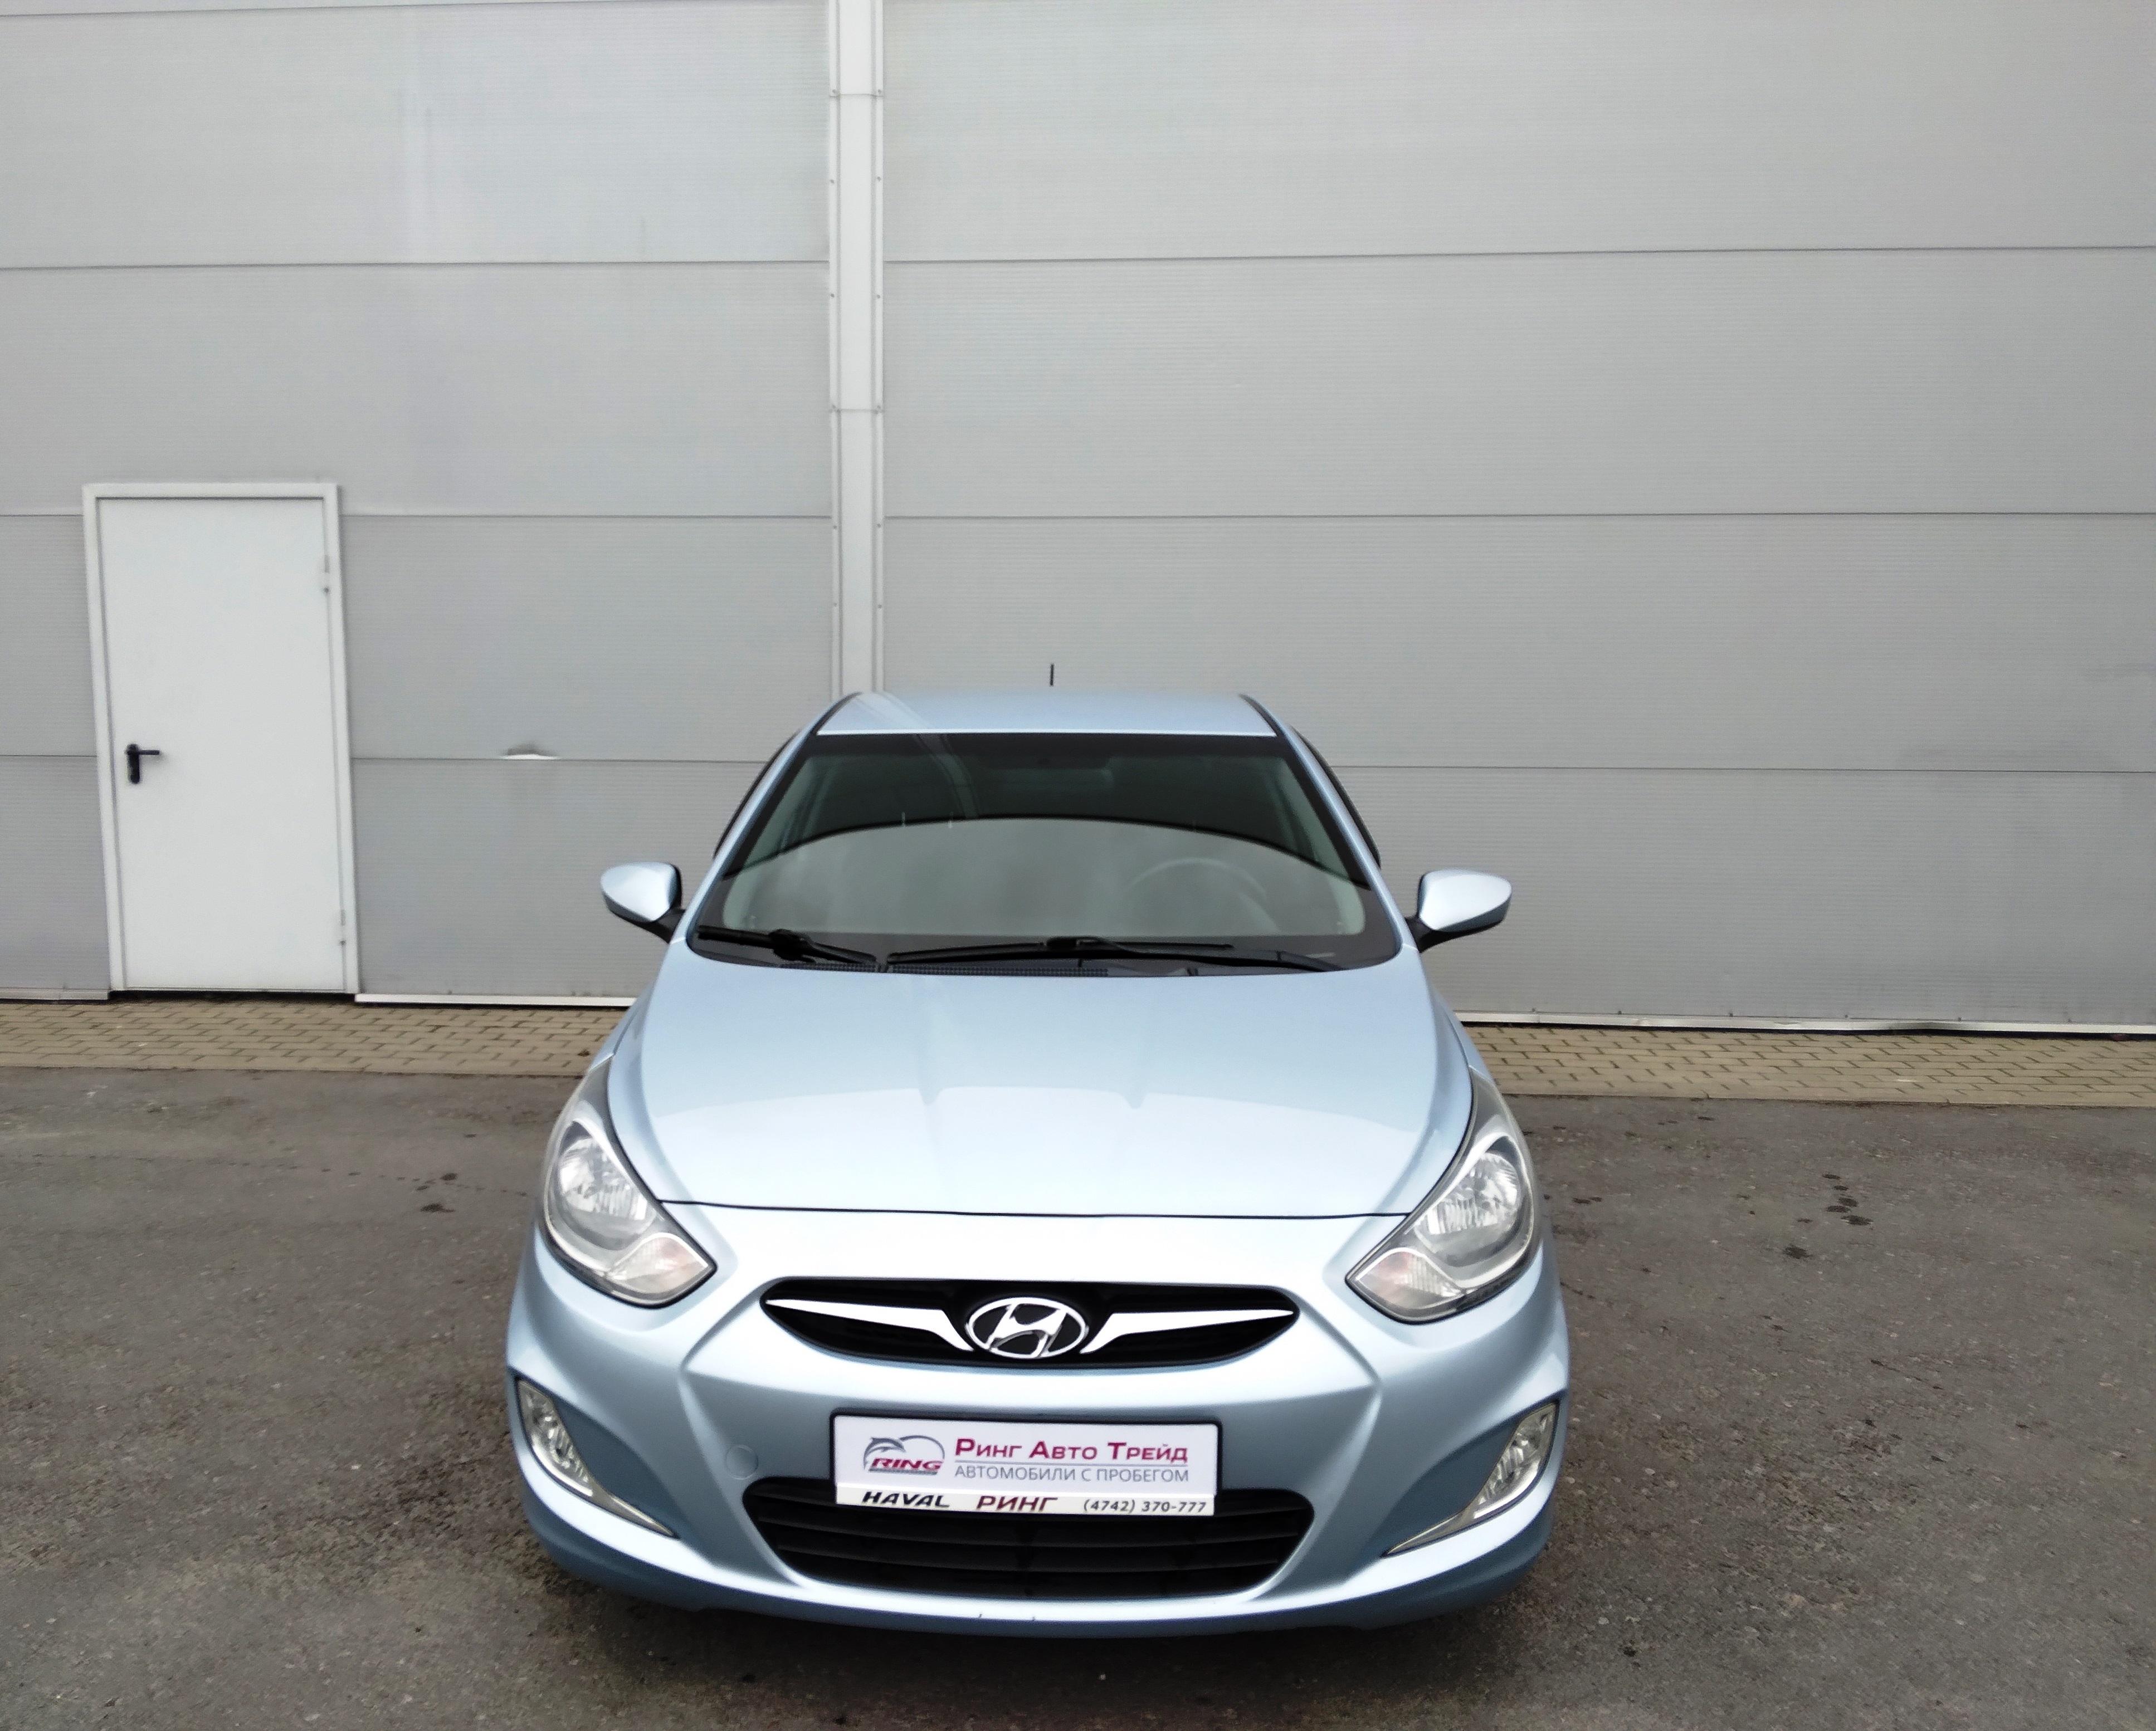 Hyundai Solaris Седан (2013г.)